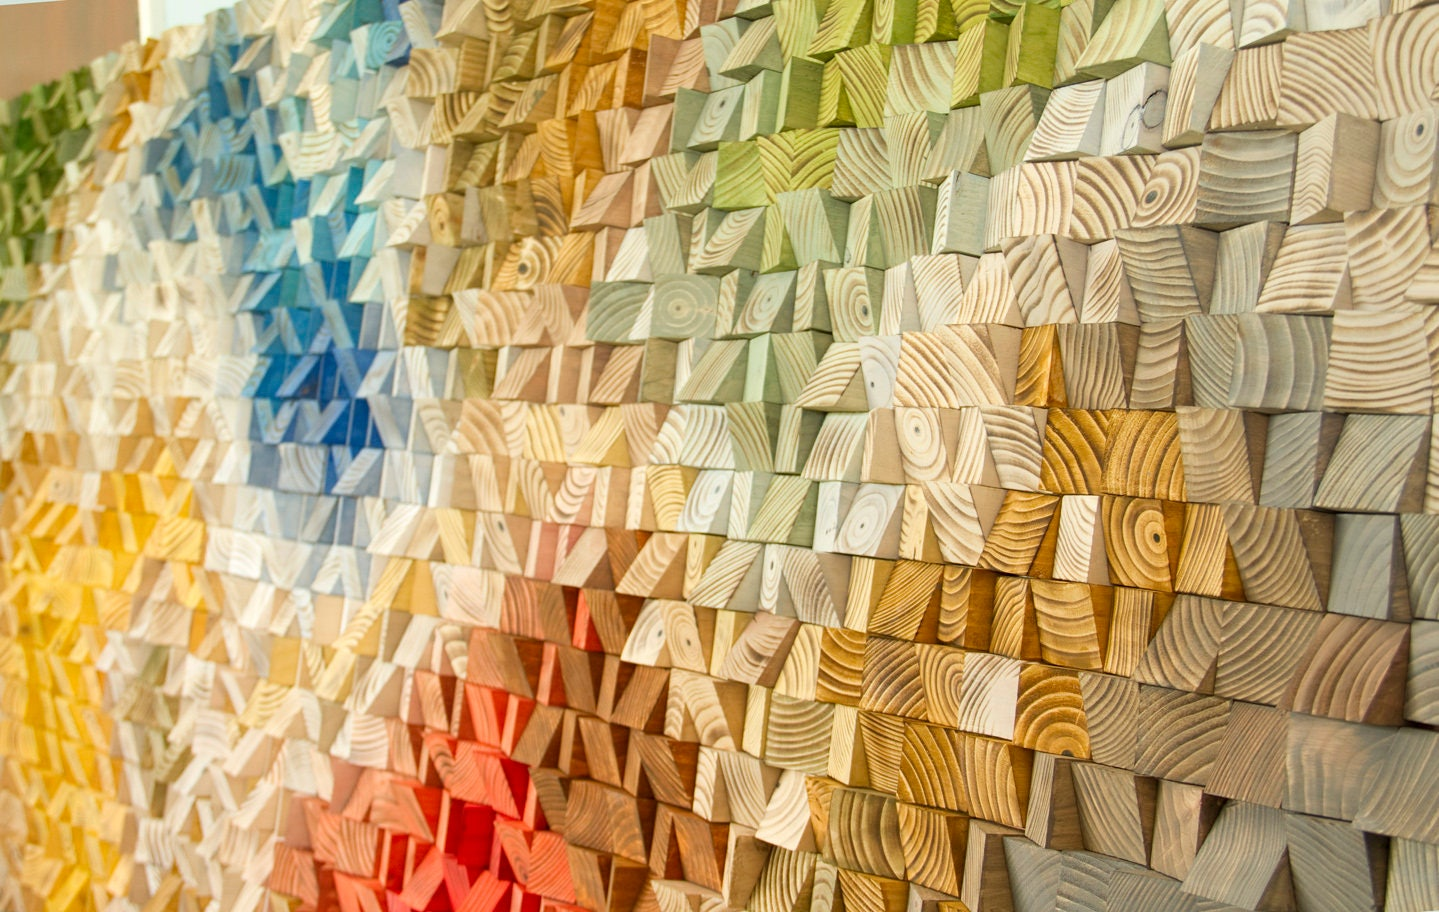 Large Wood Sculpture, Wood Wall Art, 2018 colour trend, geometric art